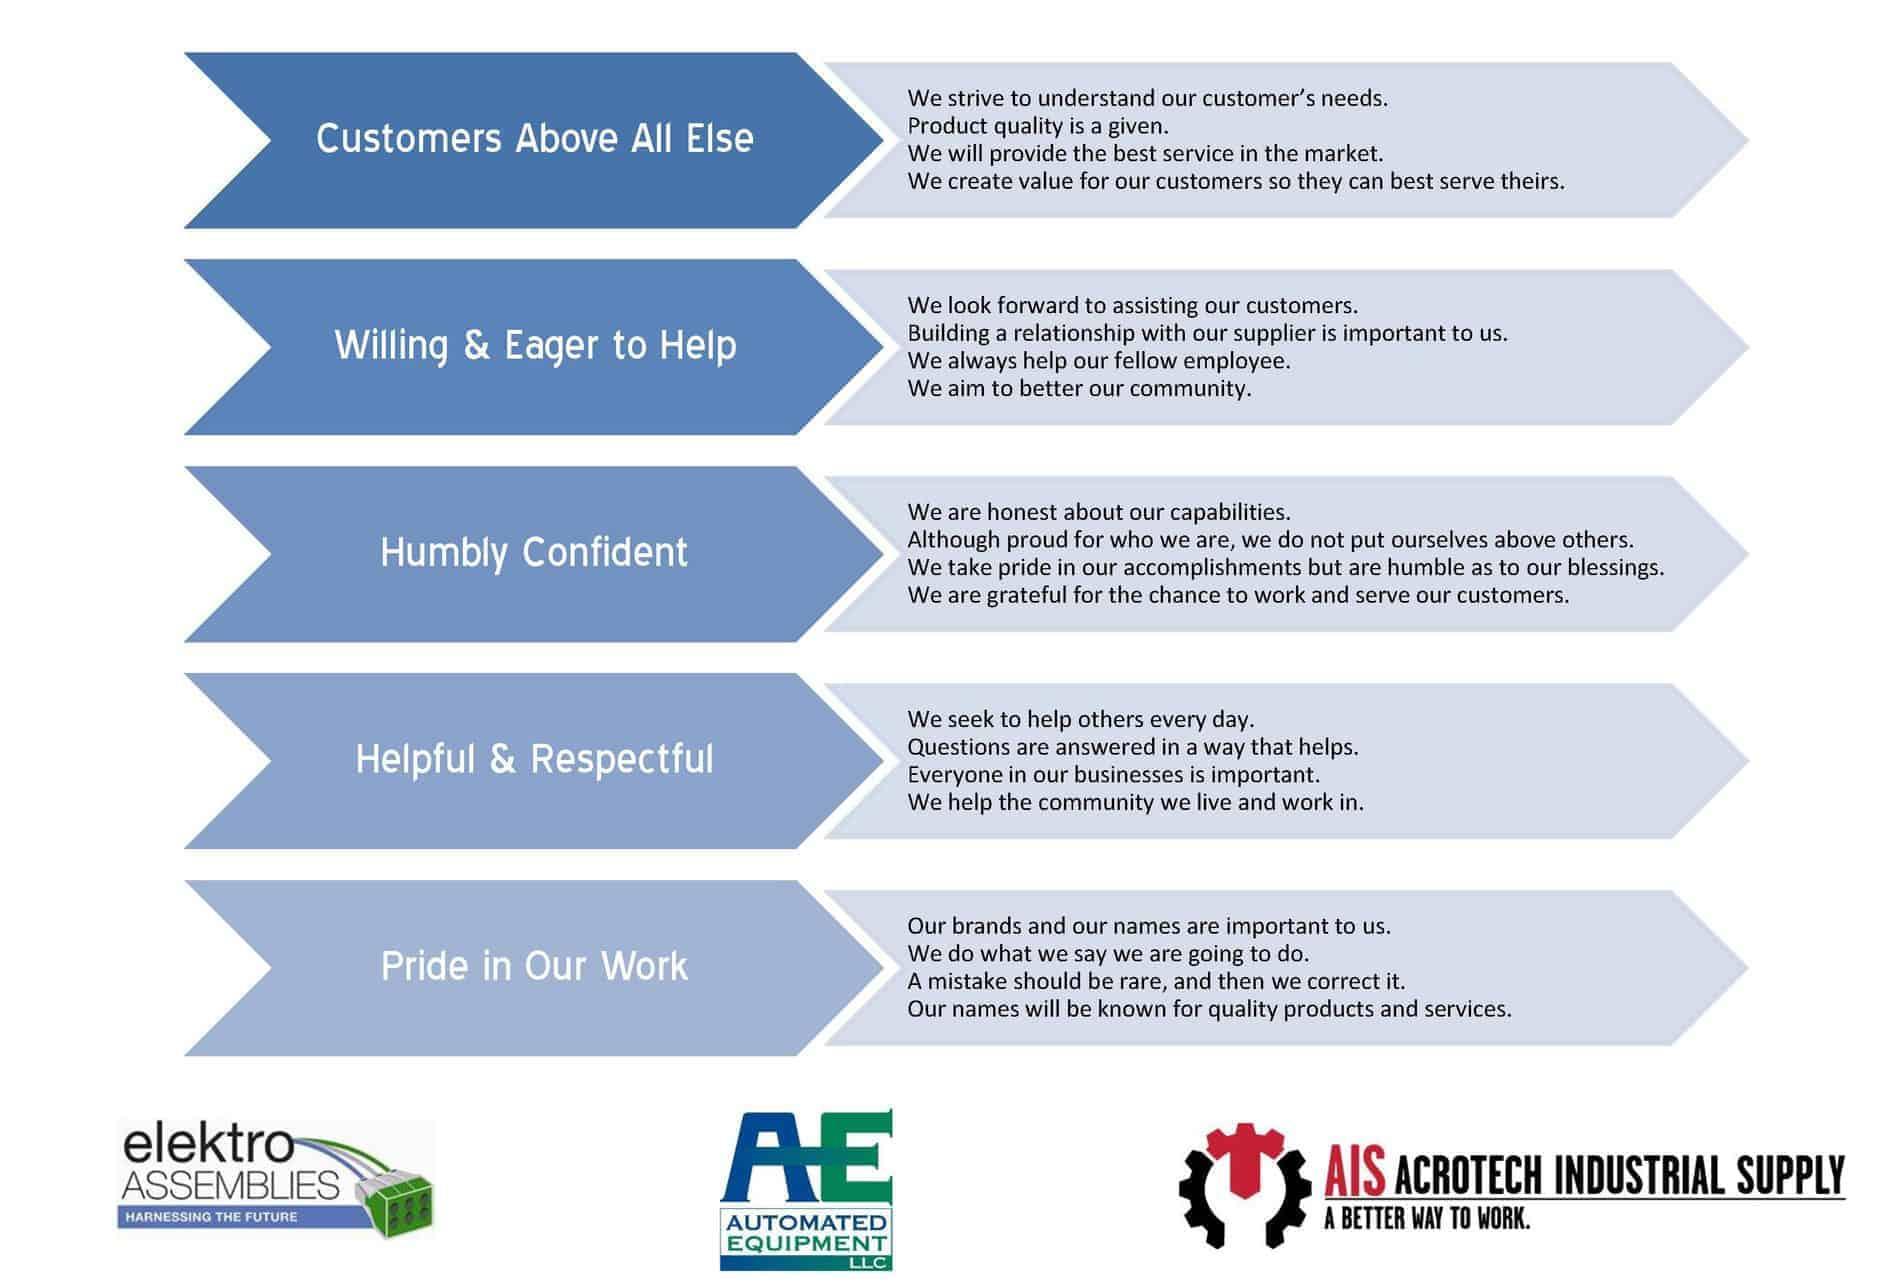 Elektro Assemblies Core Values